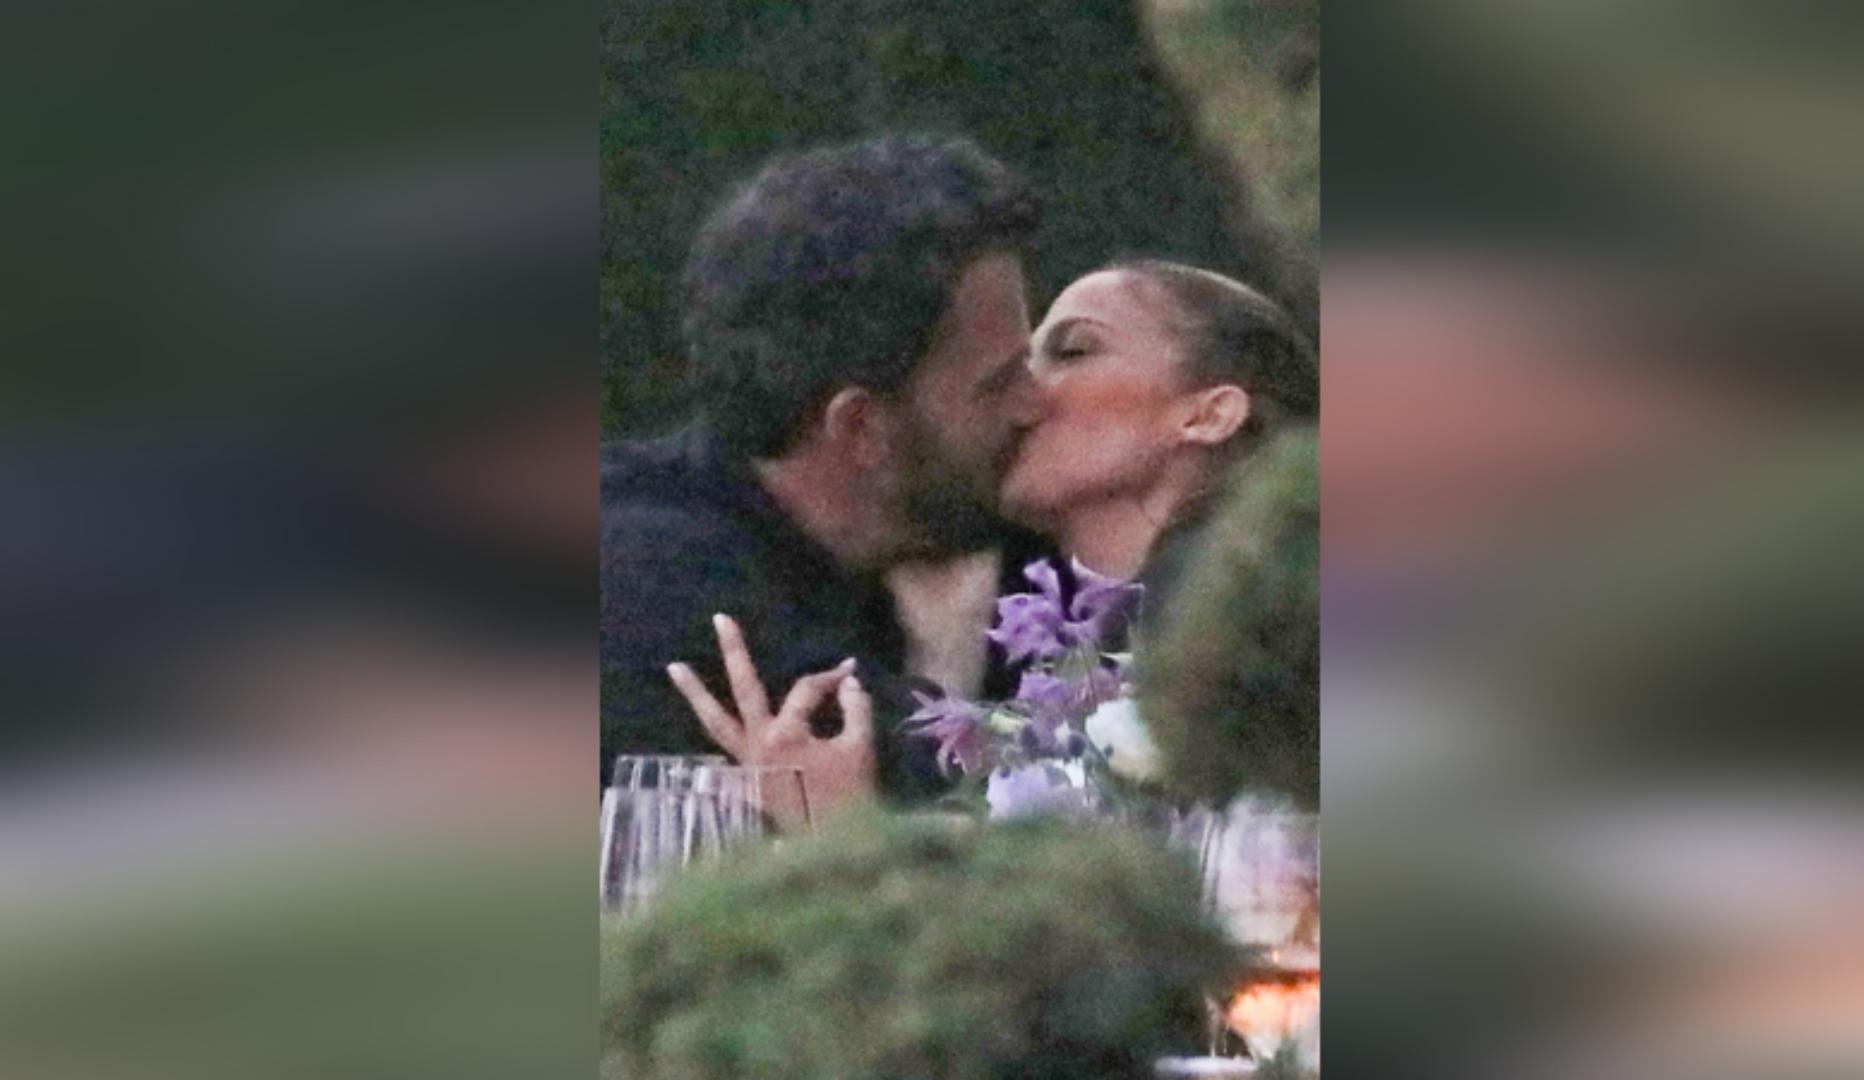 """Ну наконец-то!"": Джей Ло и Бен Аффлек застигнуты папарацци за поцелуем"